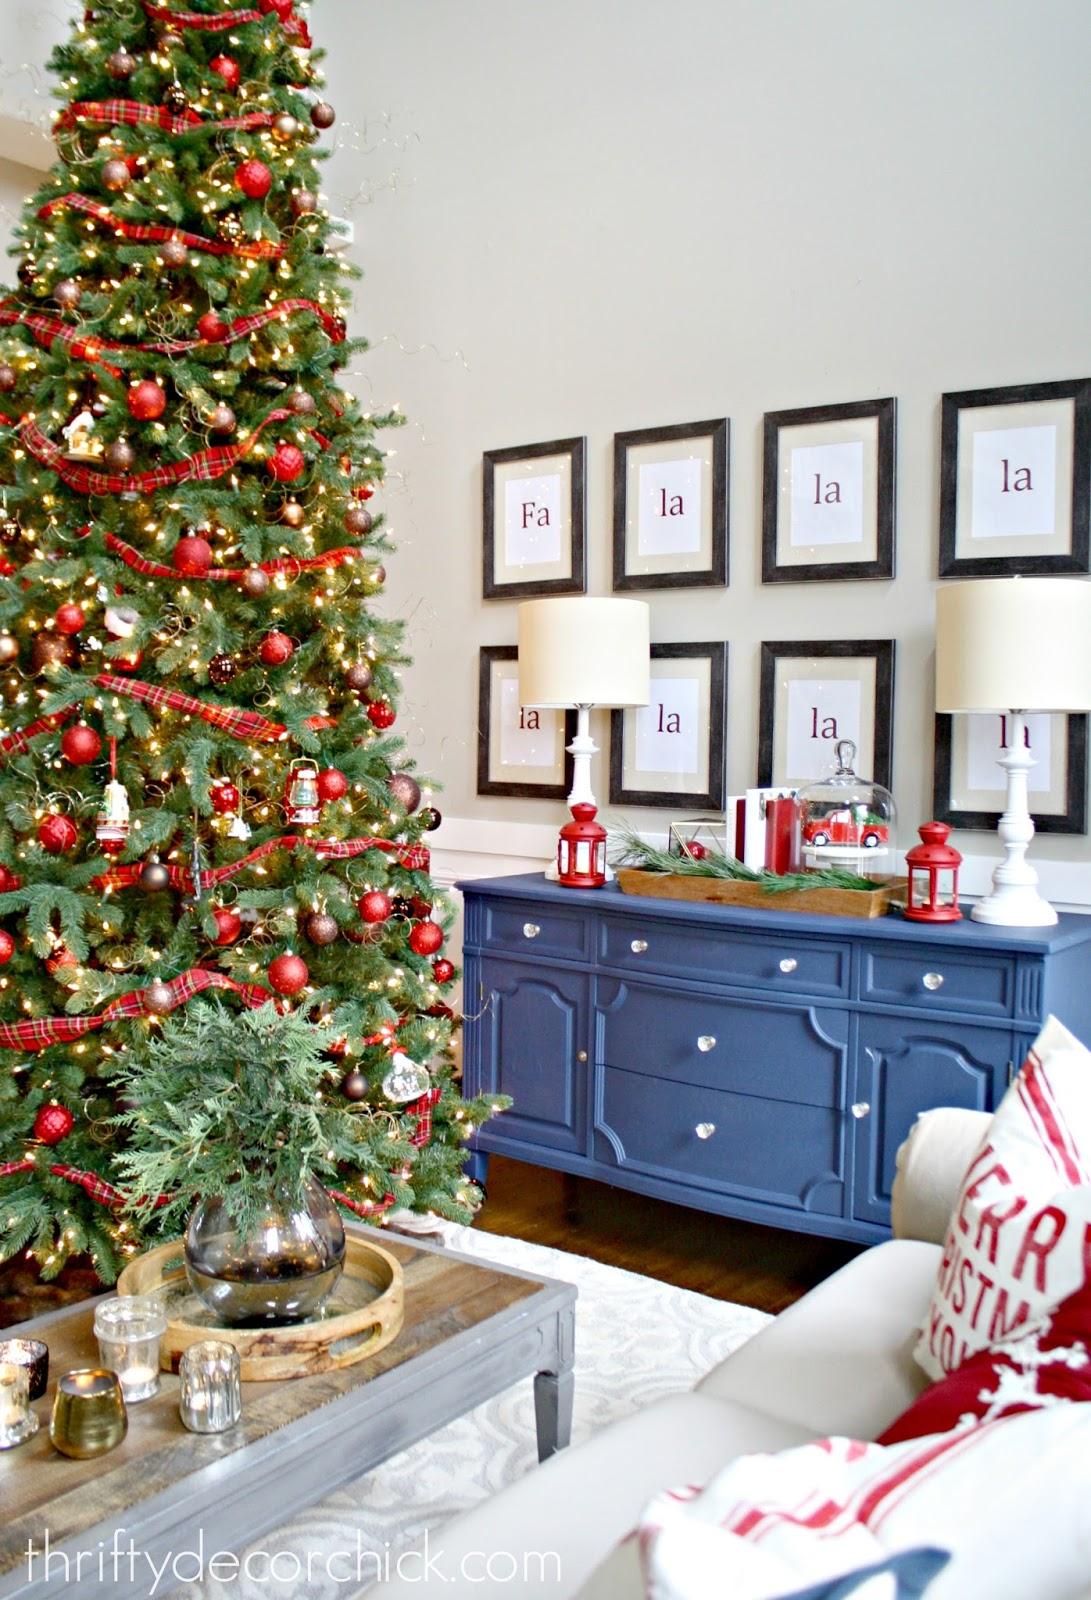 Decorate the christmas tree fa la la la - Fa La La La La Prints In Frames